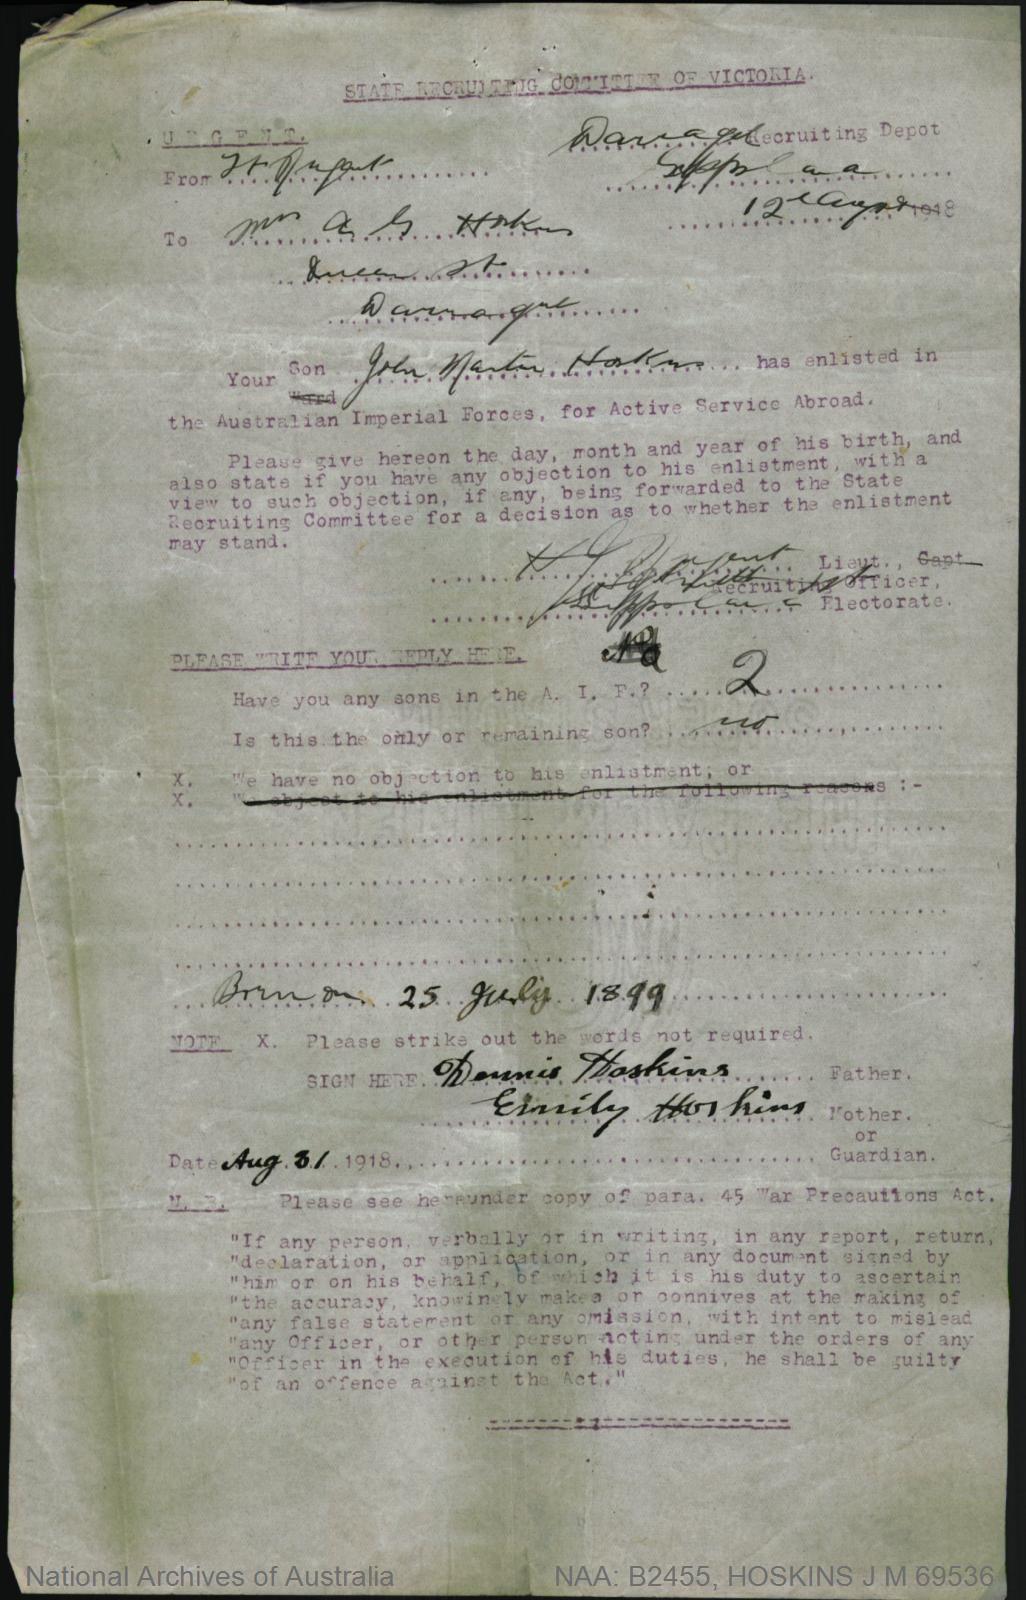 HOSKINS John Martin : Service Number - 69536 : Place of Birth - Buln Buln Vic : Place of Enlistment - Melbourne Vic : Next of Kin - (Father) HOSKINS Dennis